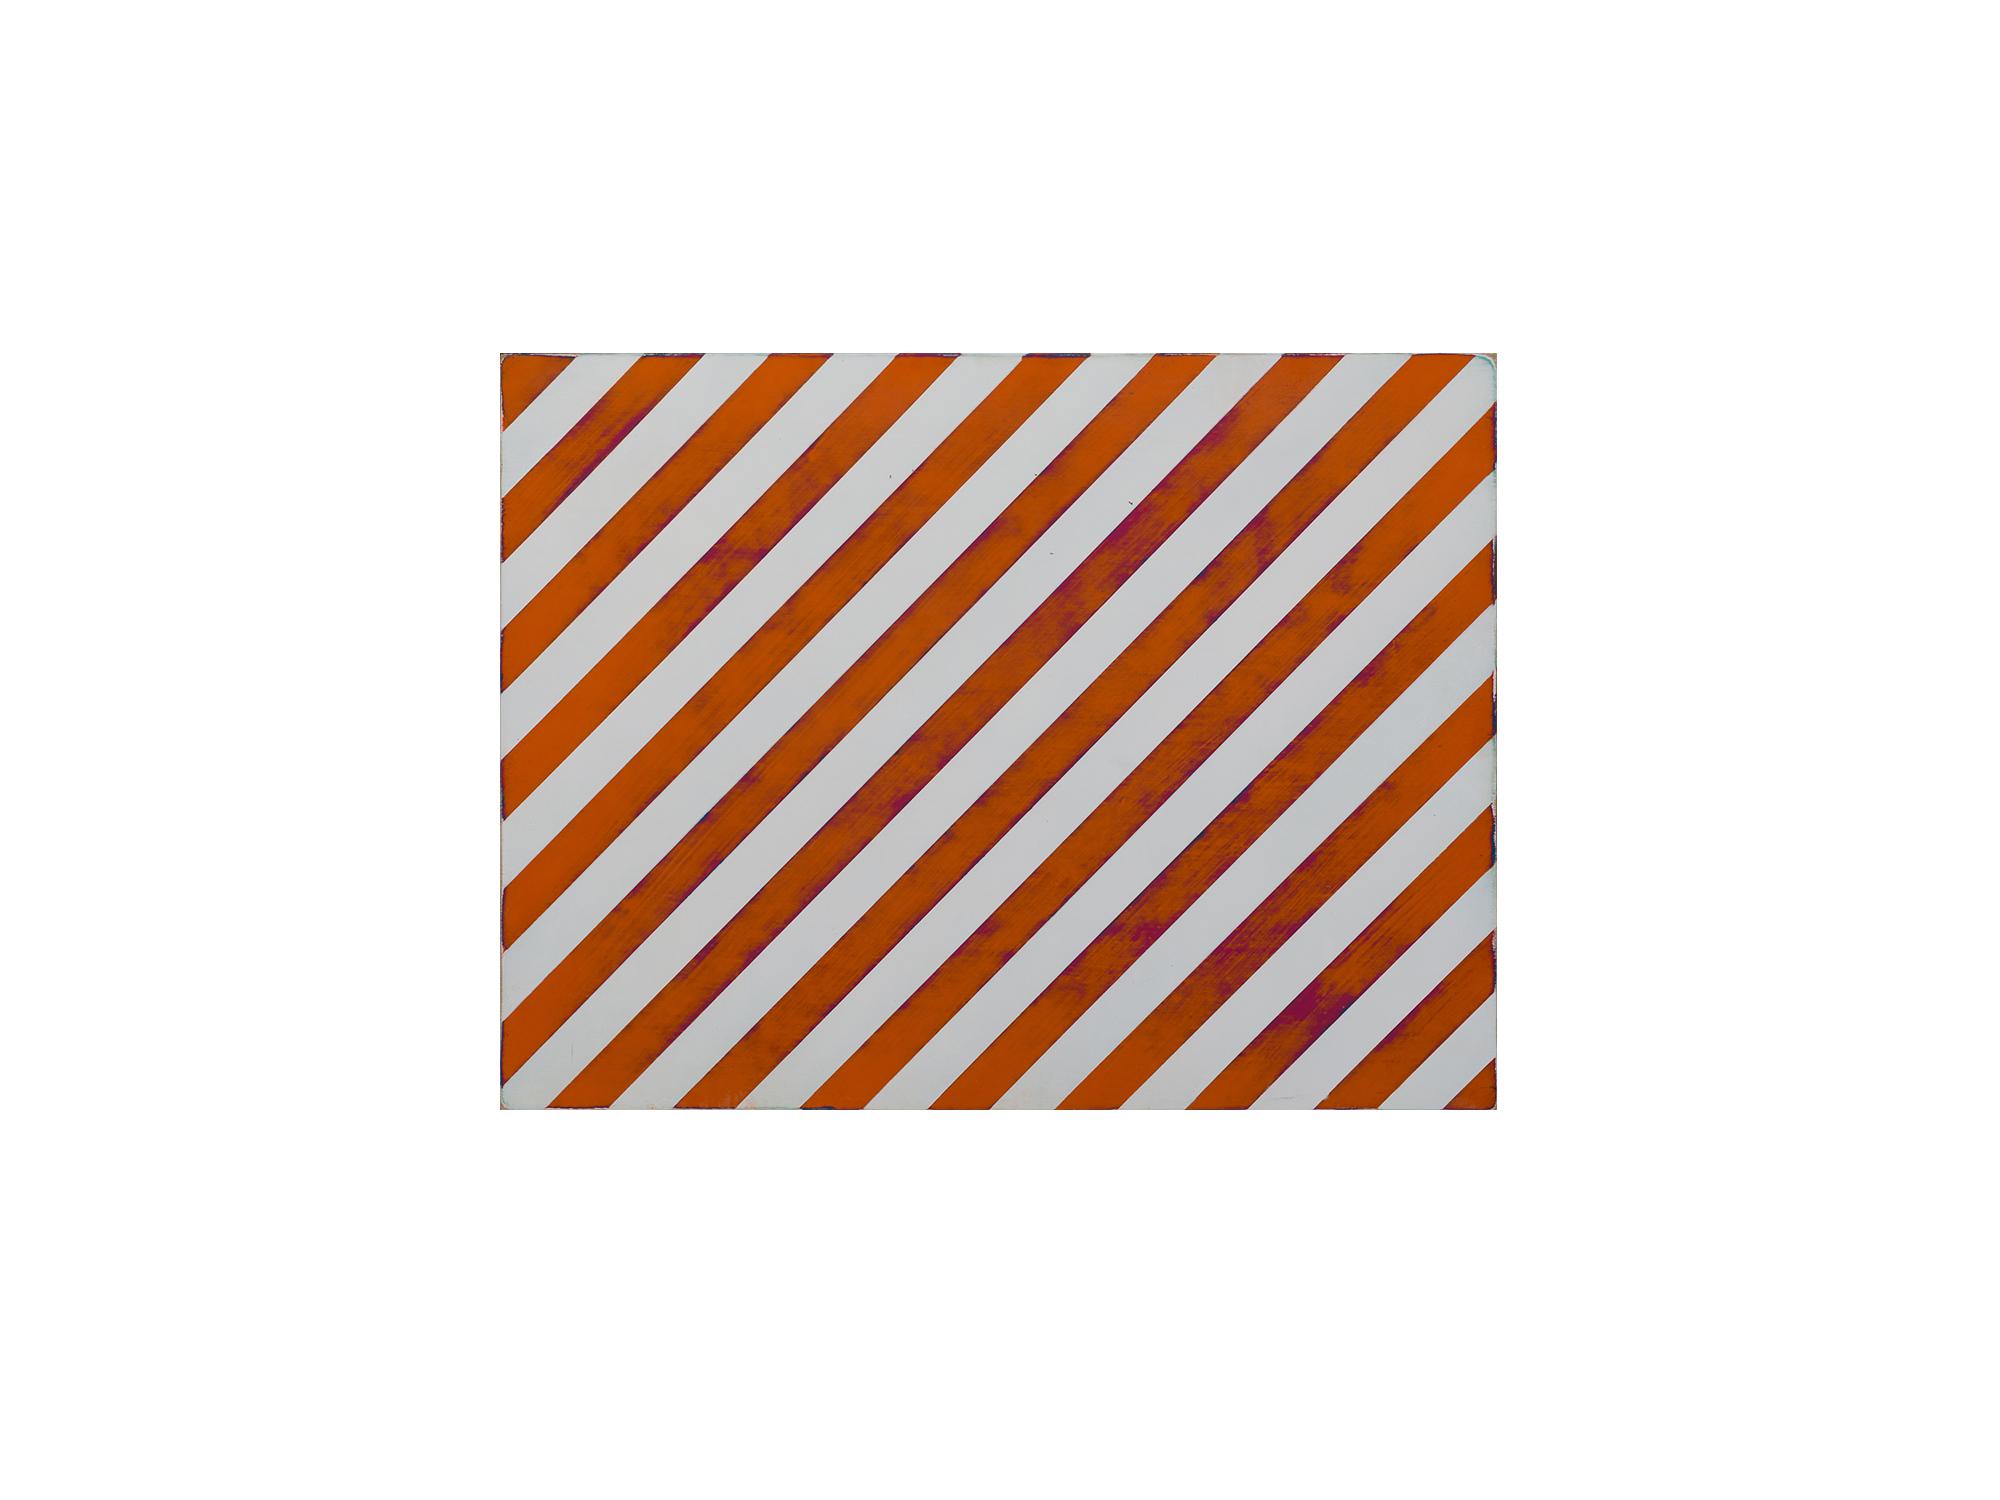 Brett McMahon   KL City 10 , 2017 acrylic and enamel on ply panel 60 x 80cm   ARTIST BIO